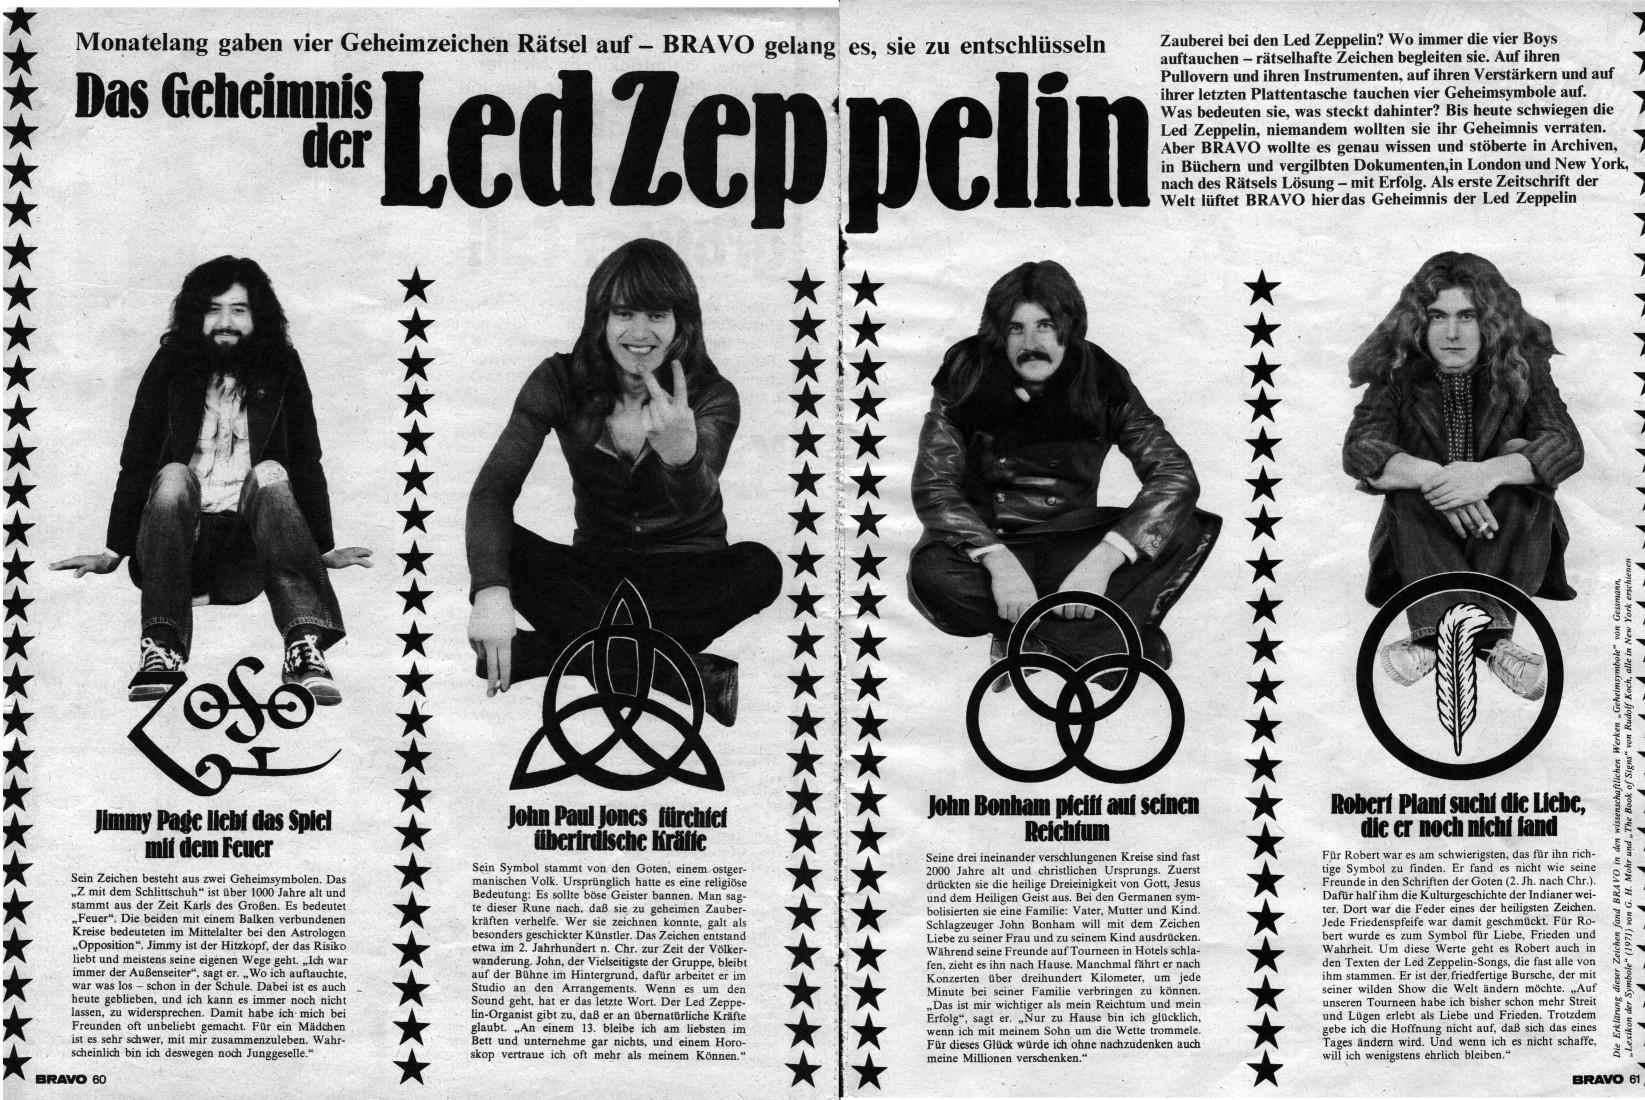 LED Zeppelin Symbols Meanings